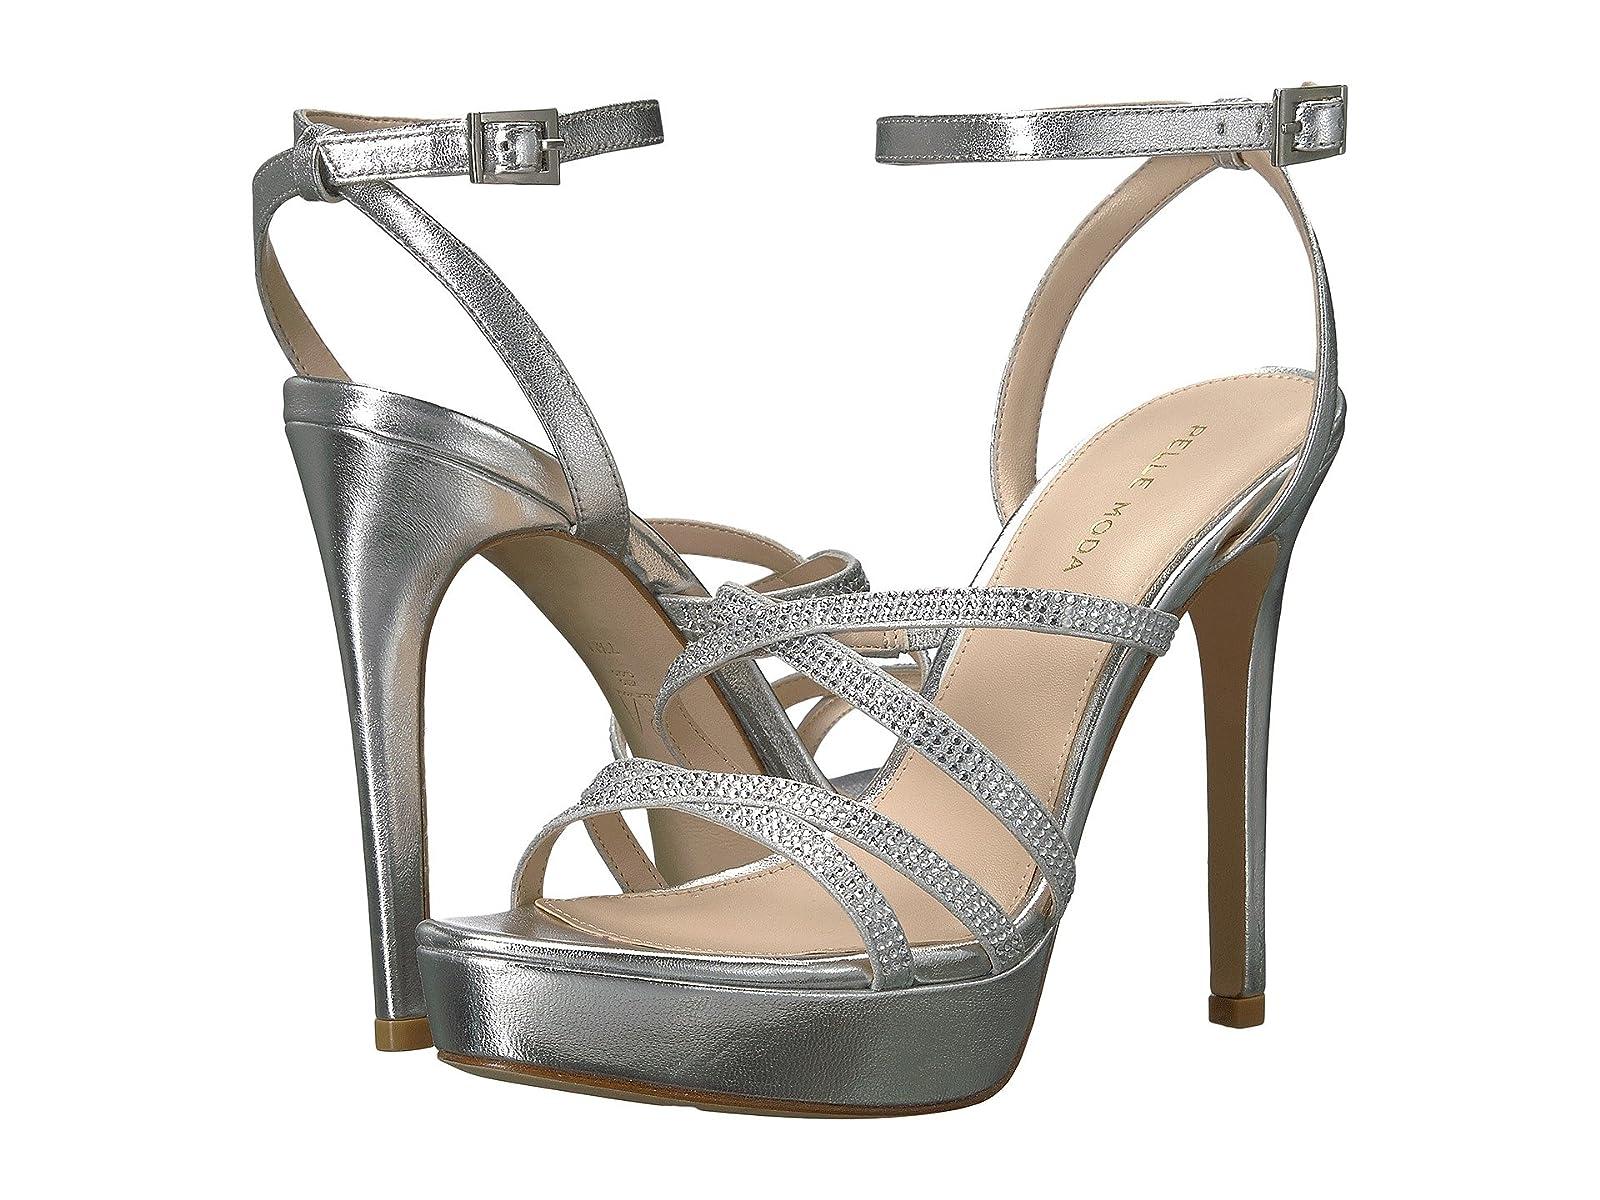 Pelle Moda OakCheap and distinctive eye-catching shoes